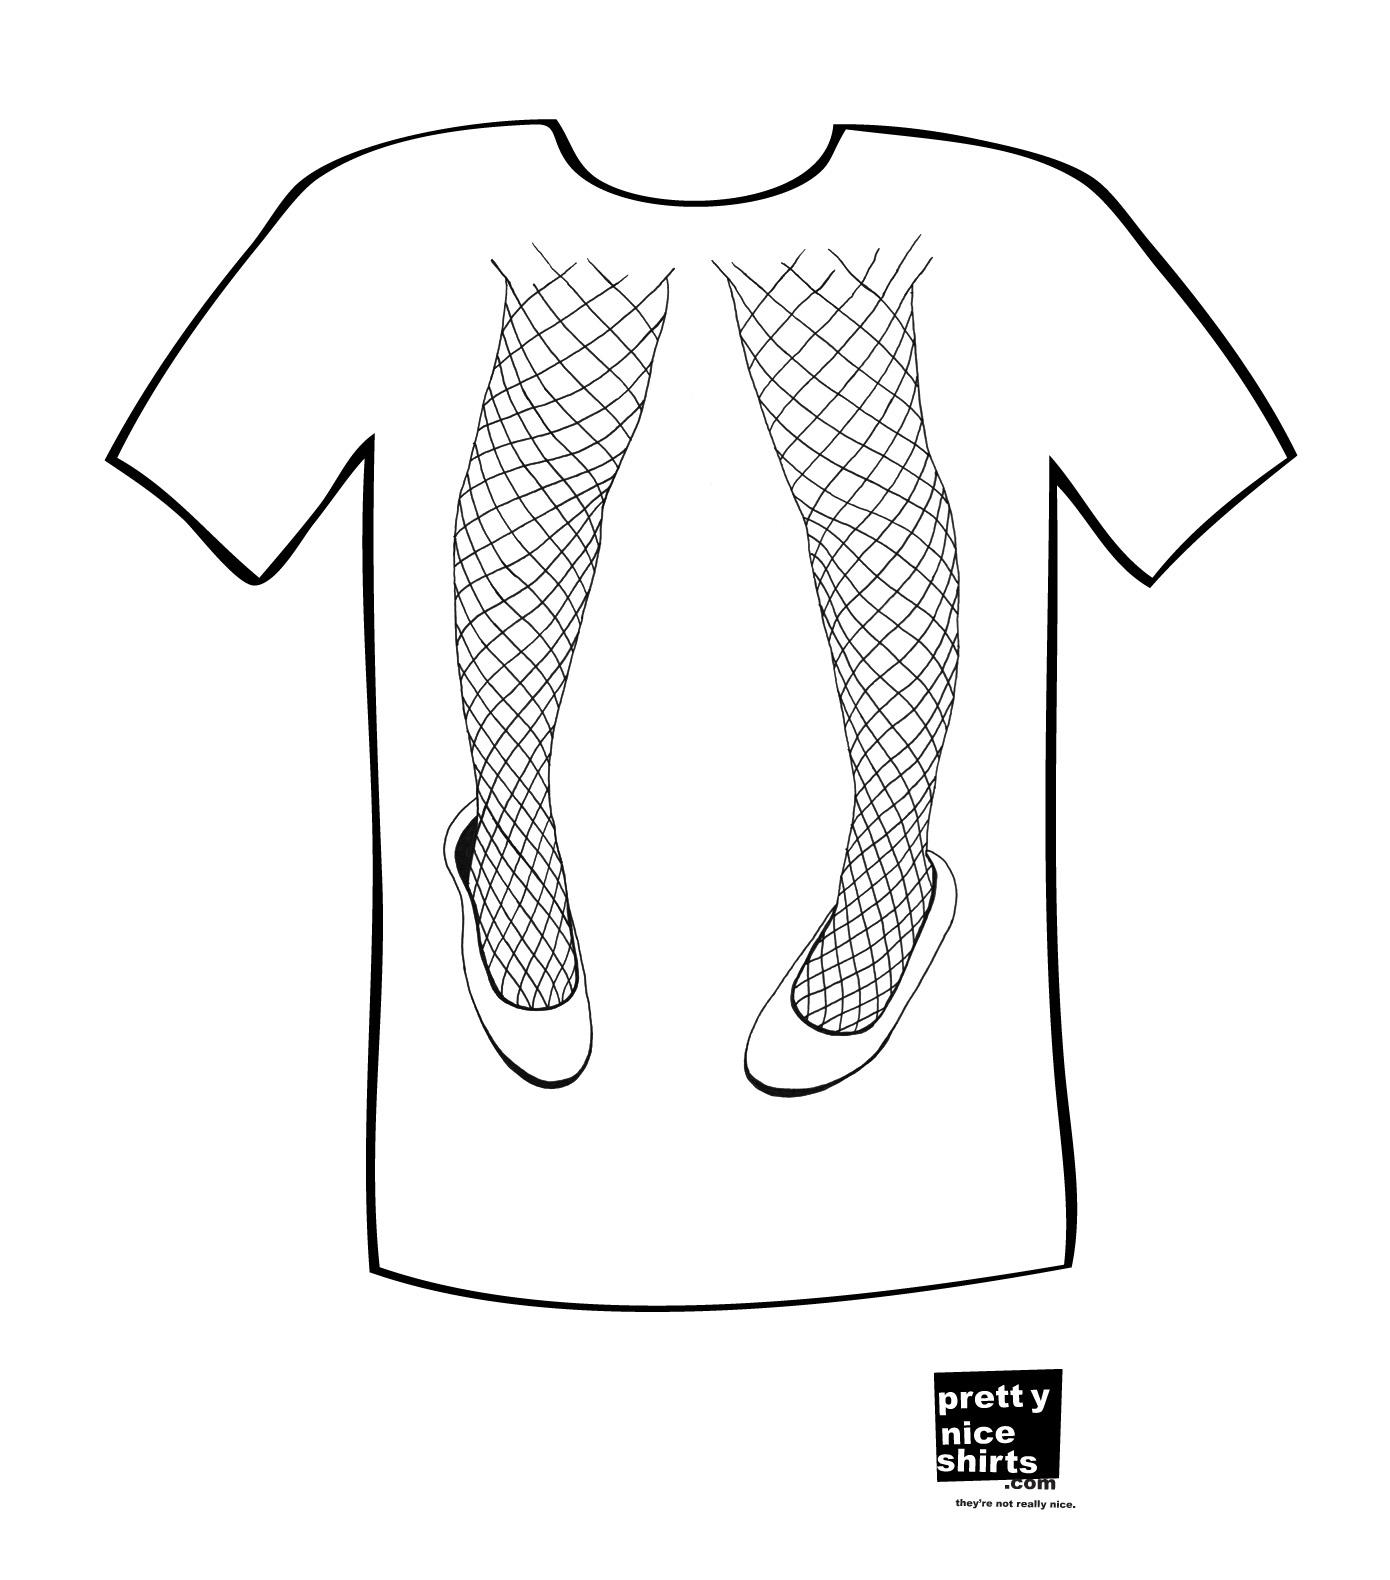 20170516_PNS-designs_LAH_the-legs